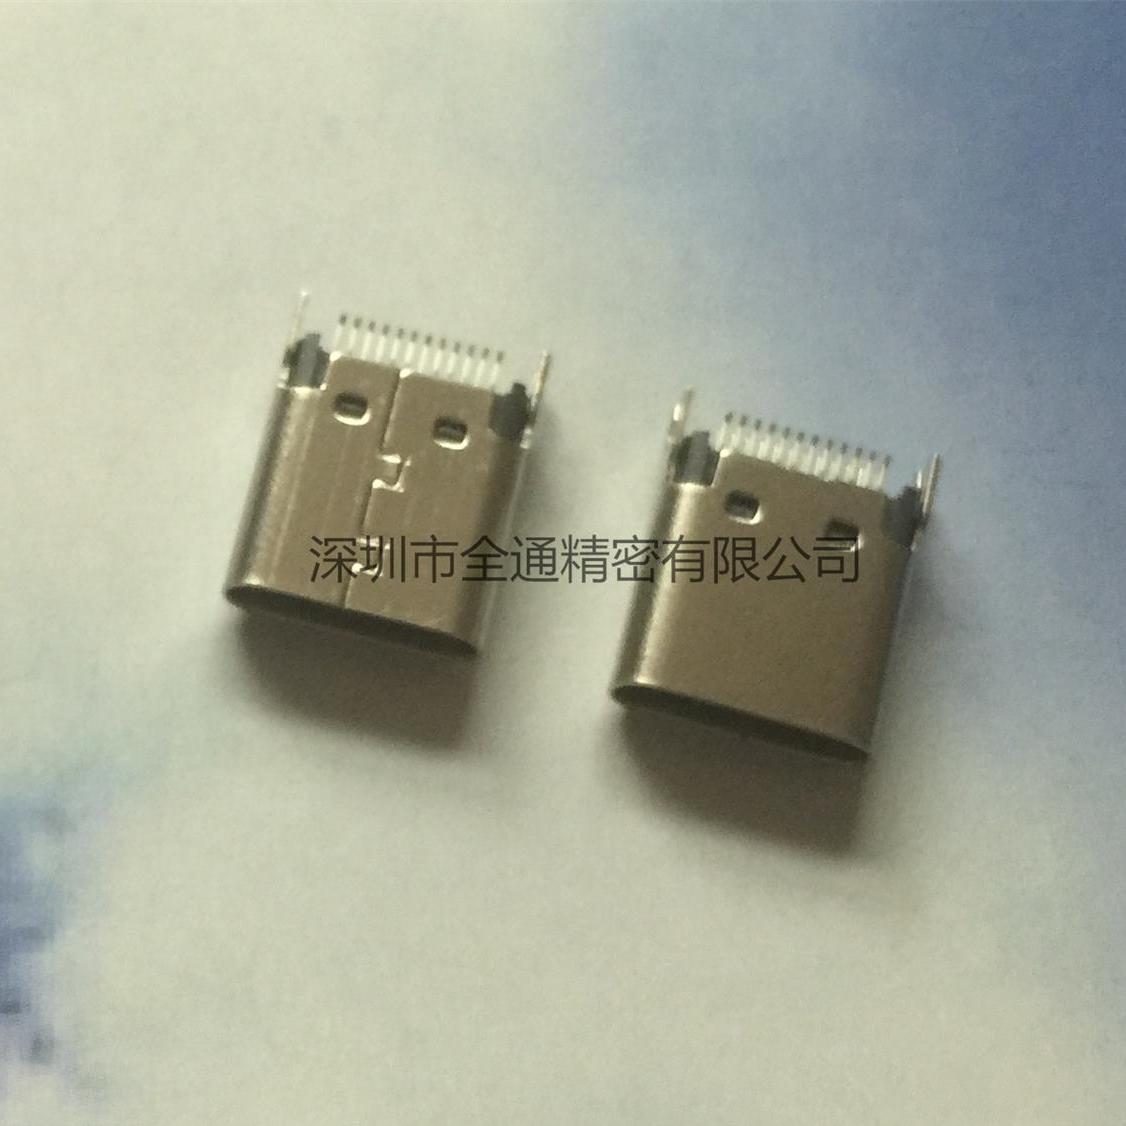 usb 3.1type-c母座夹板0.8短体 厂家直销